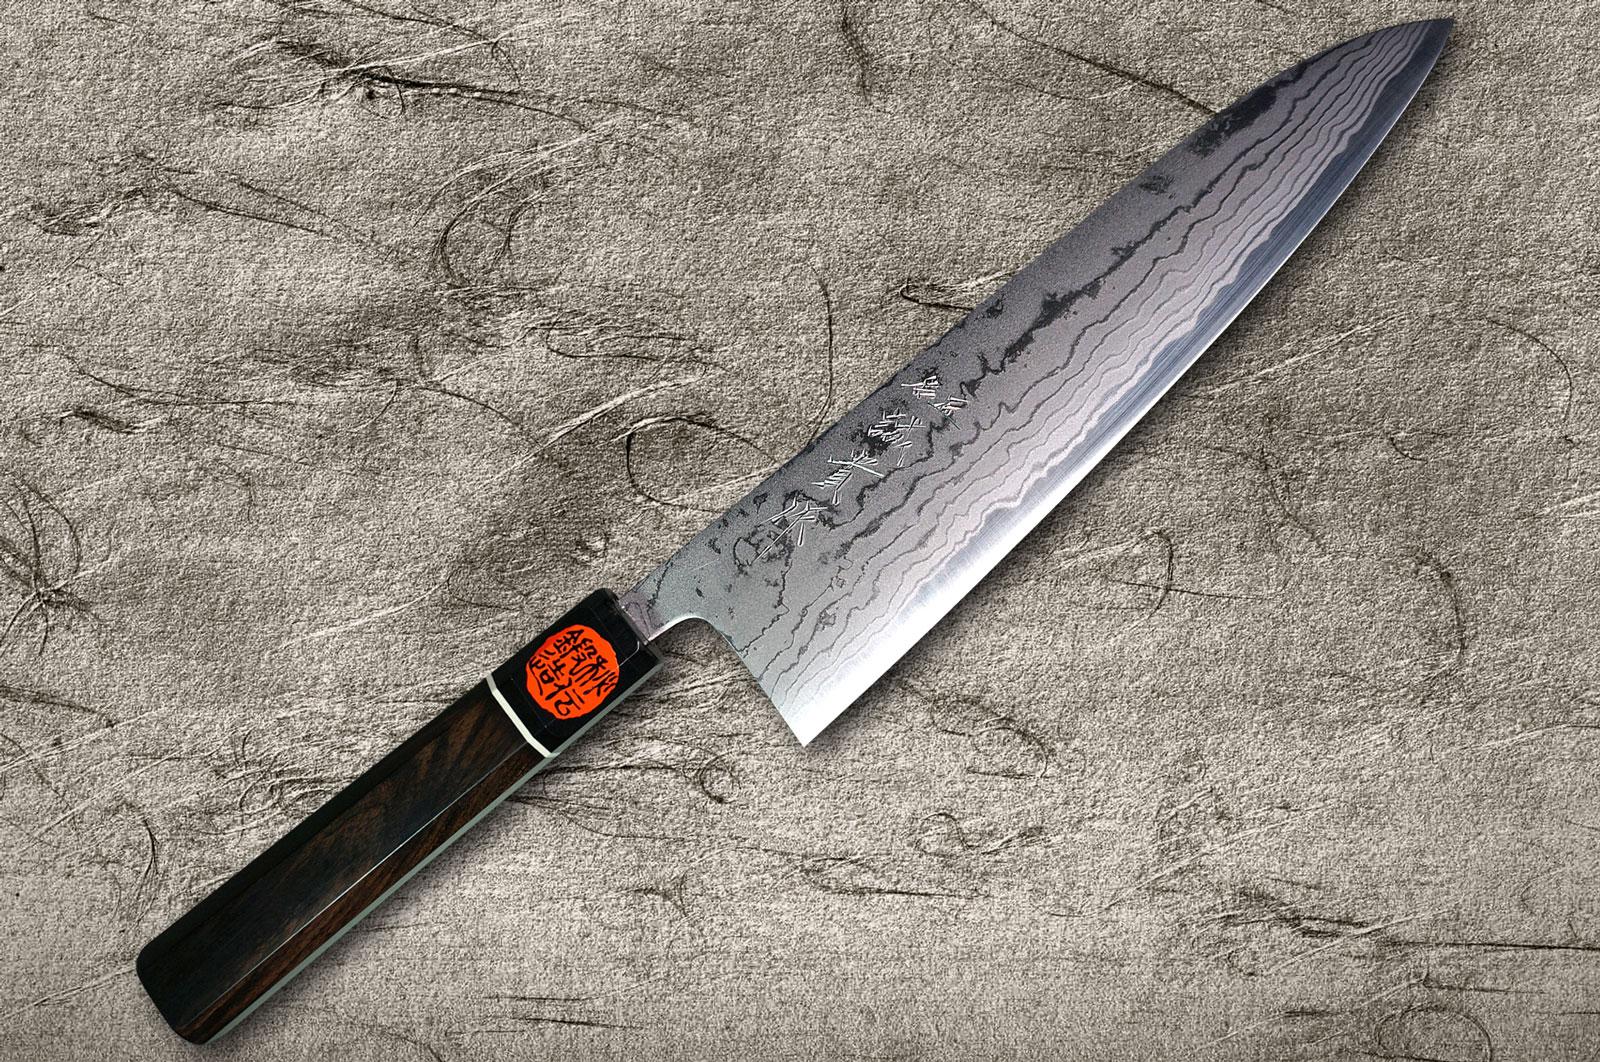 Phenomenal Shigeki Tanaka Aogami Blue No 2 Damascus Chef Knives With Download Free Architecture Designs Scobabritishbridgeorg